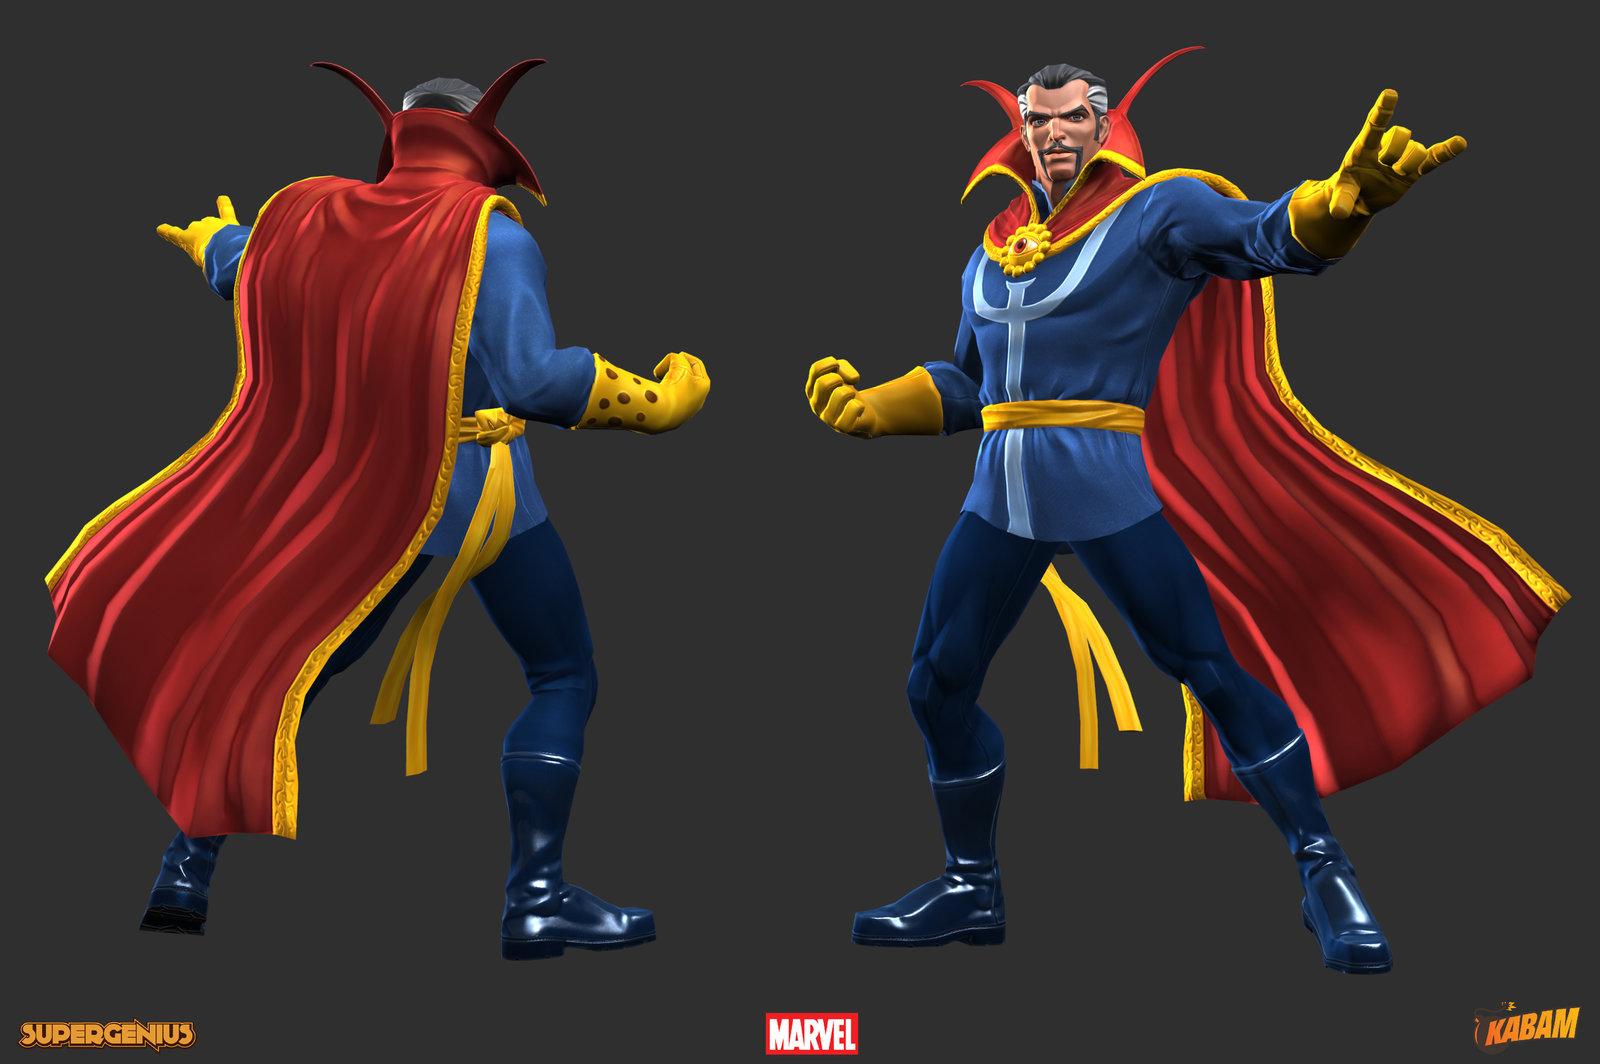 Marvel: Dr. Strange